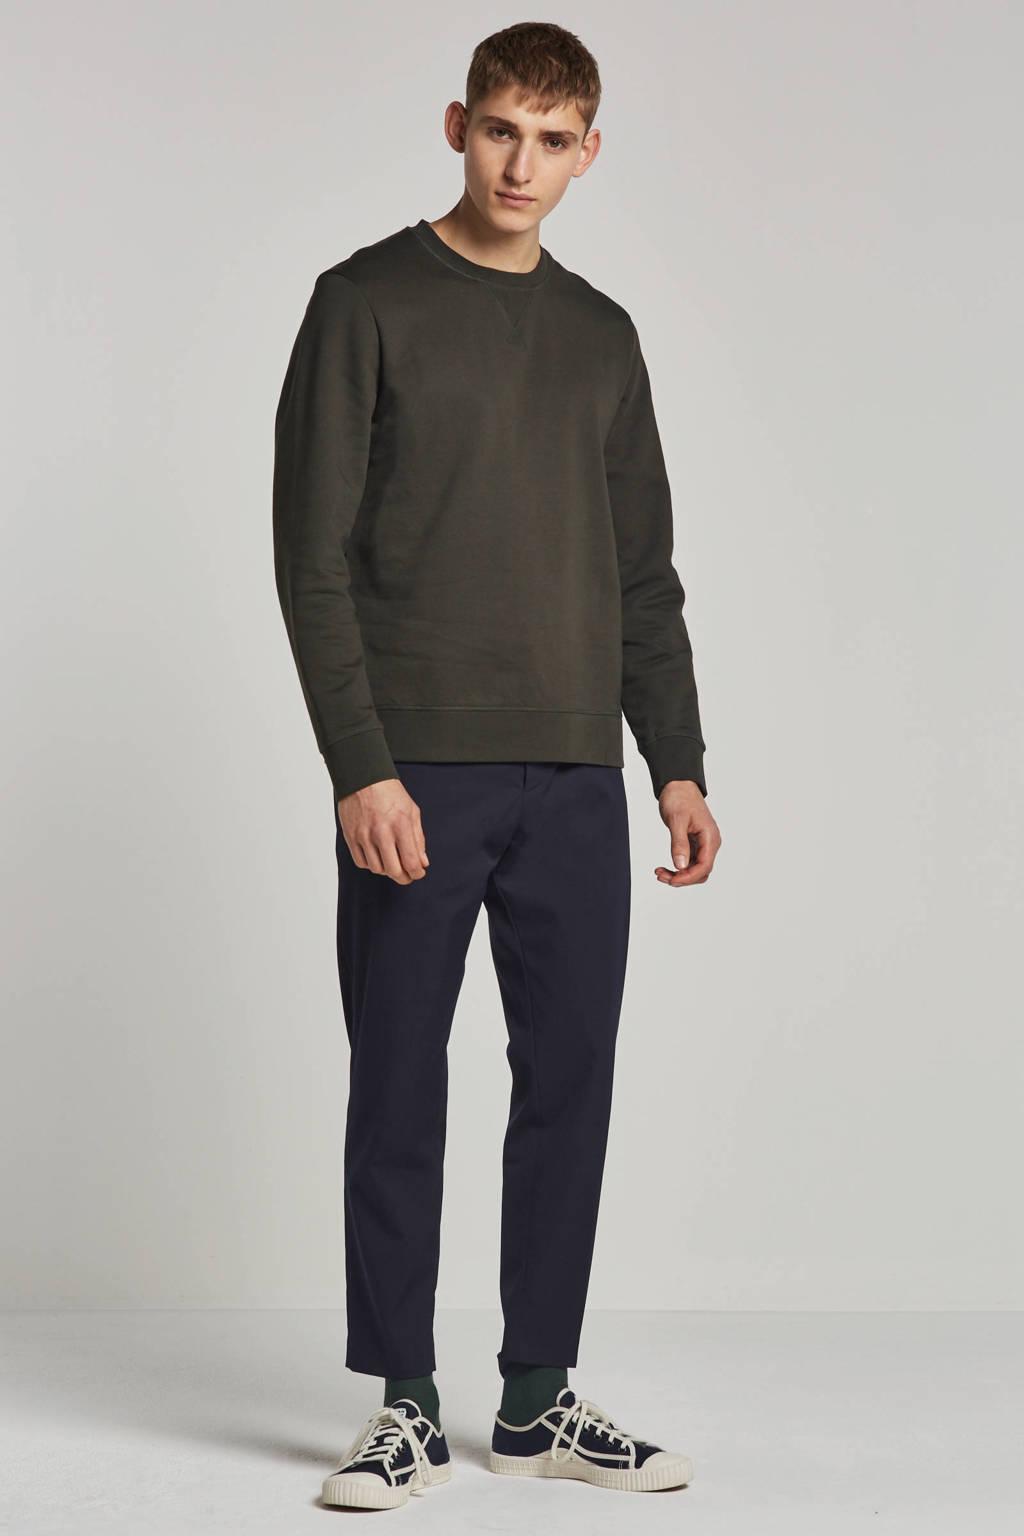 Minimum sweater, Donkergroen